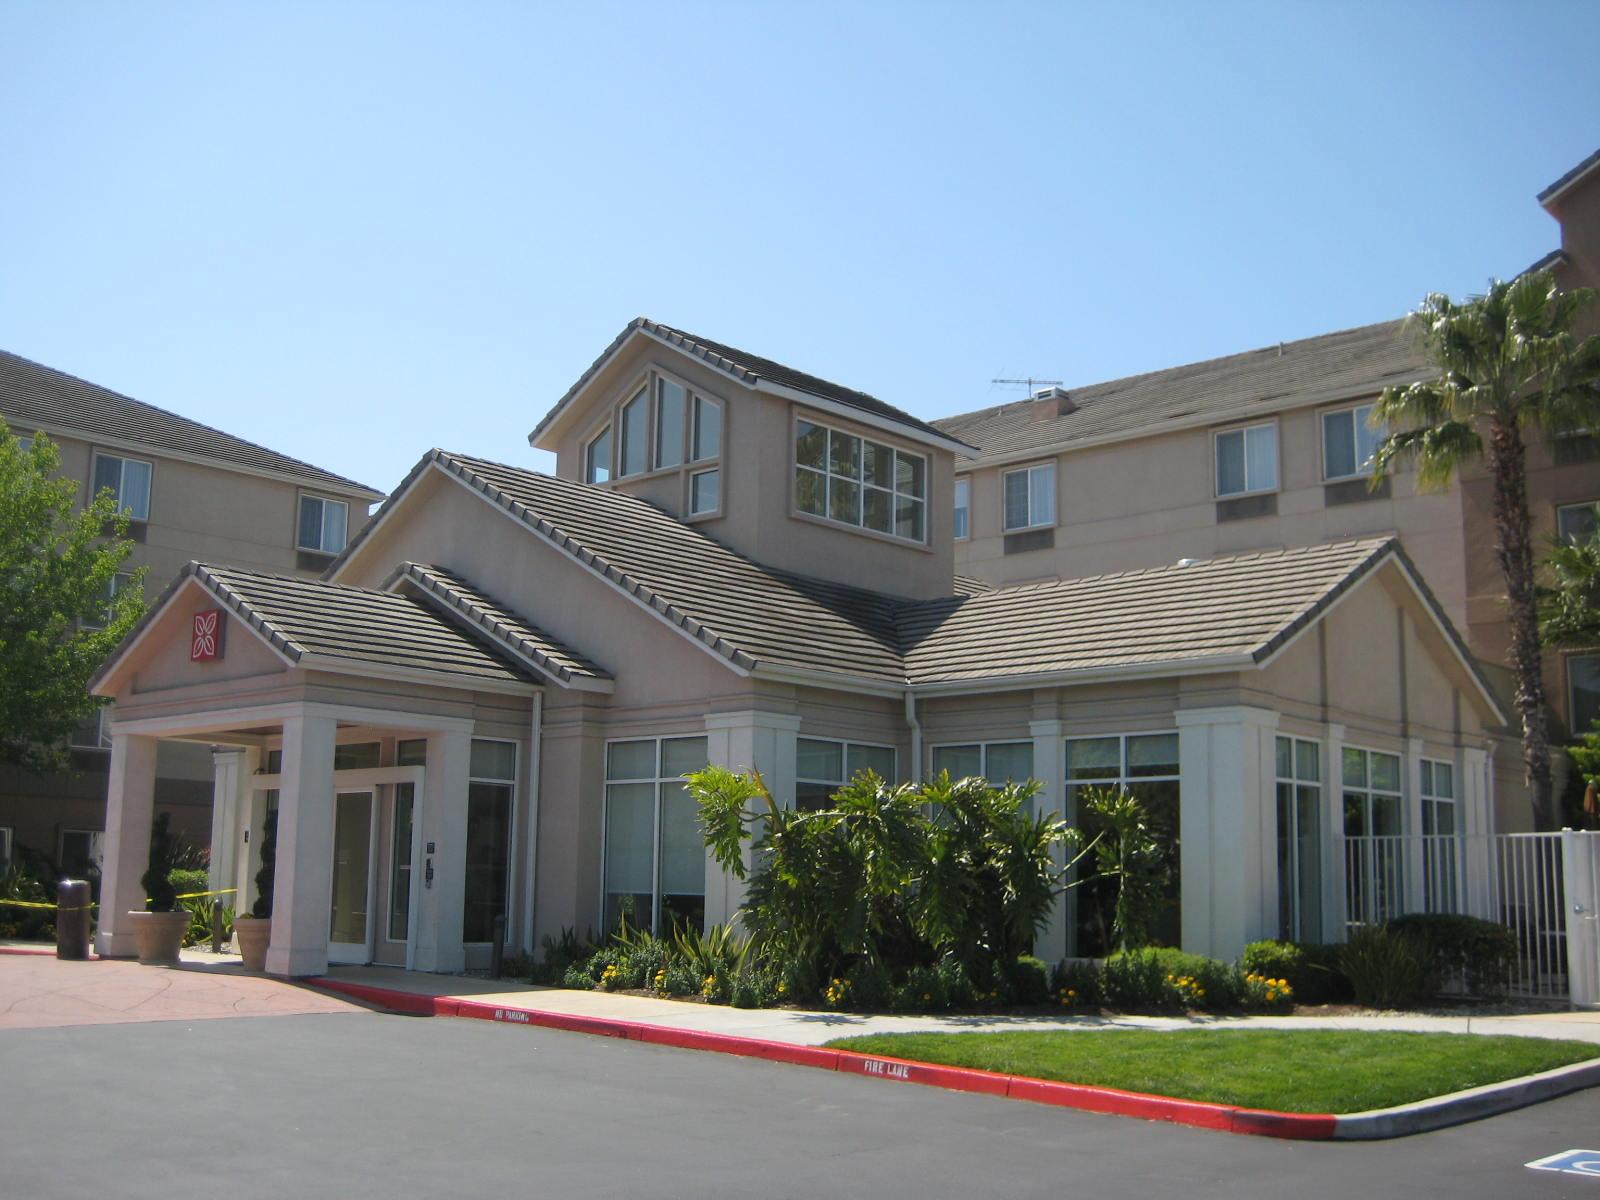 hilton garden inn san jose milpitas milpitas california hotel hilton garden inn